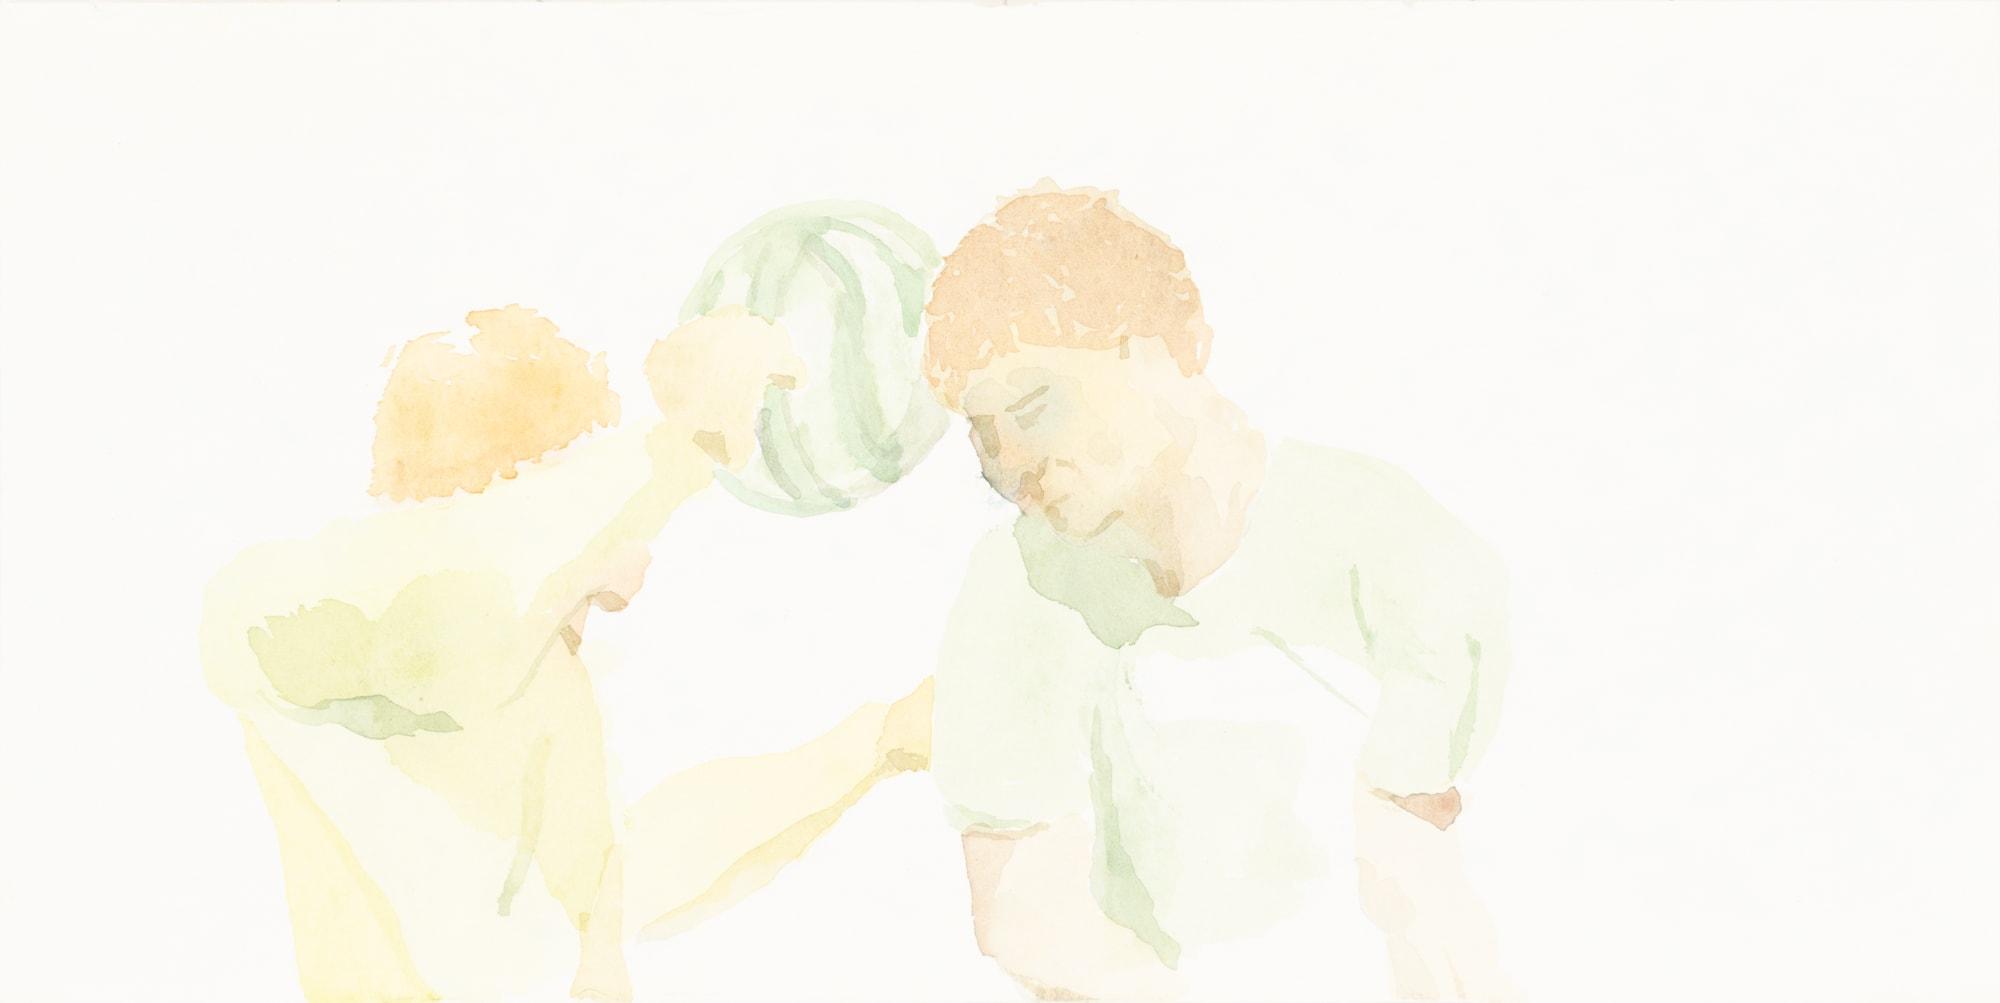 Malerei, Aquarell auf Papier, 30cm x 15cm, Basketball mit Melone, artist: Franziska King